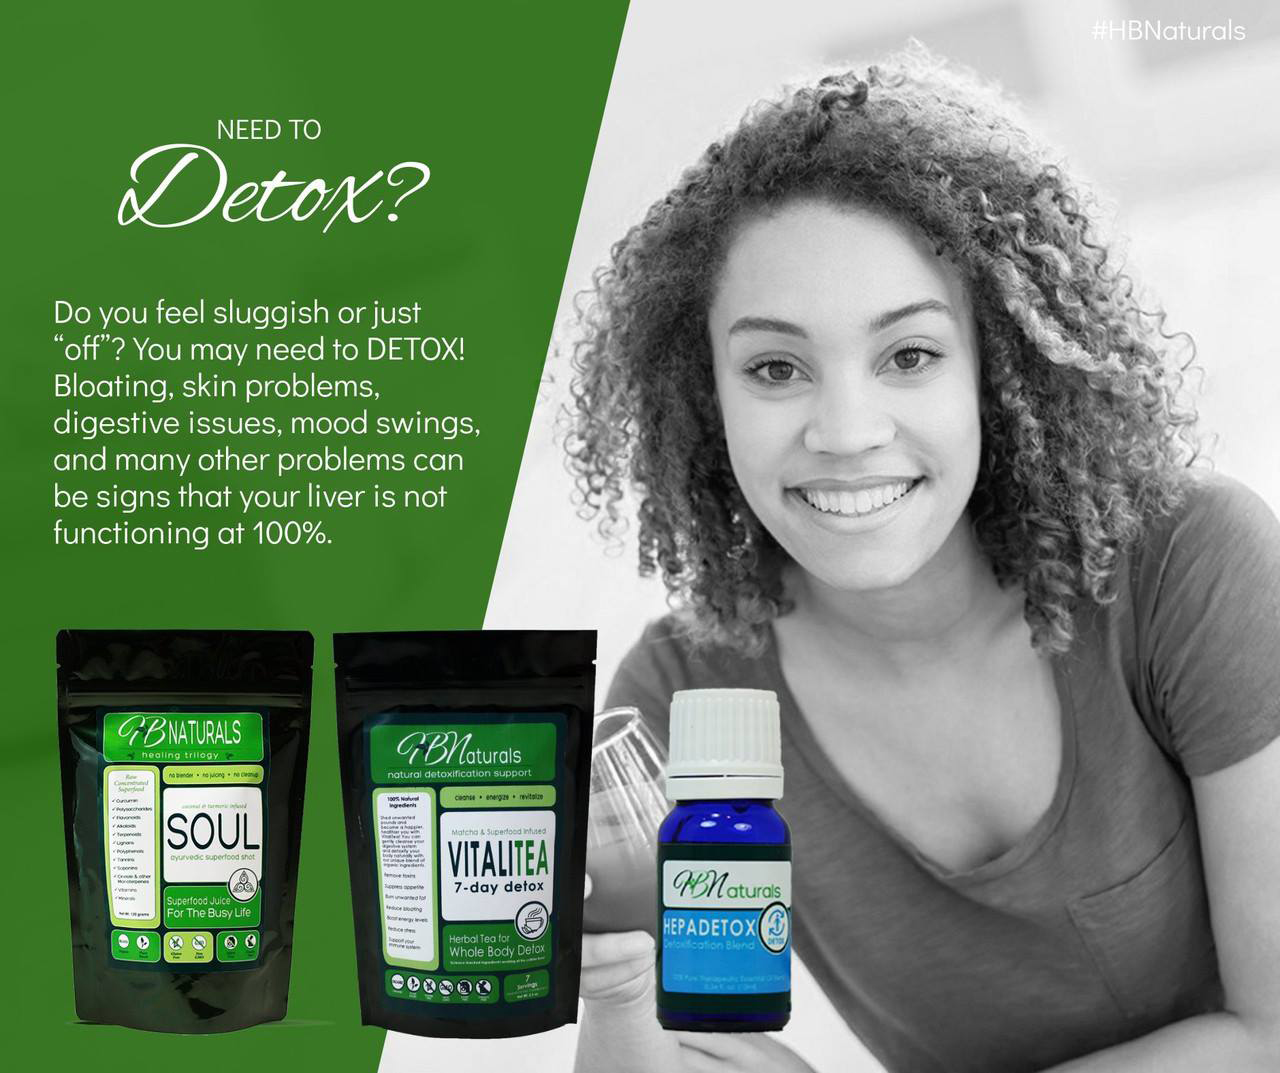 Needing to Detox?